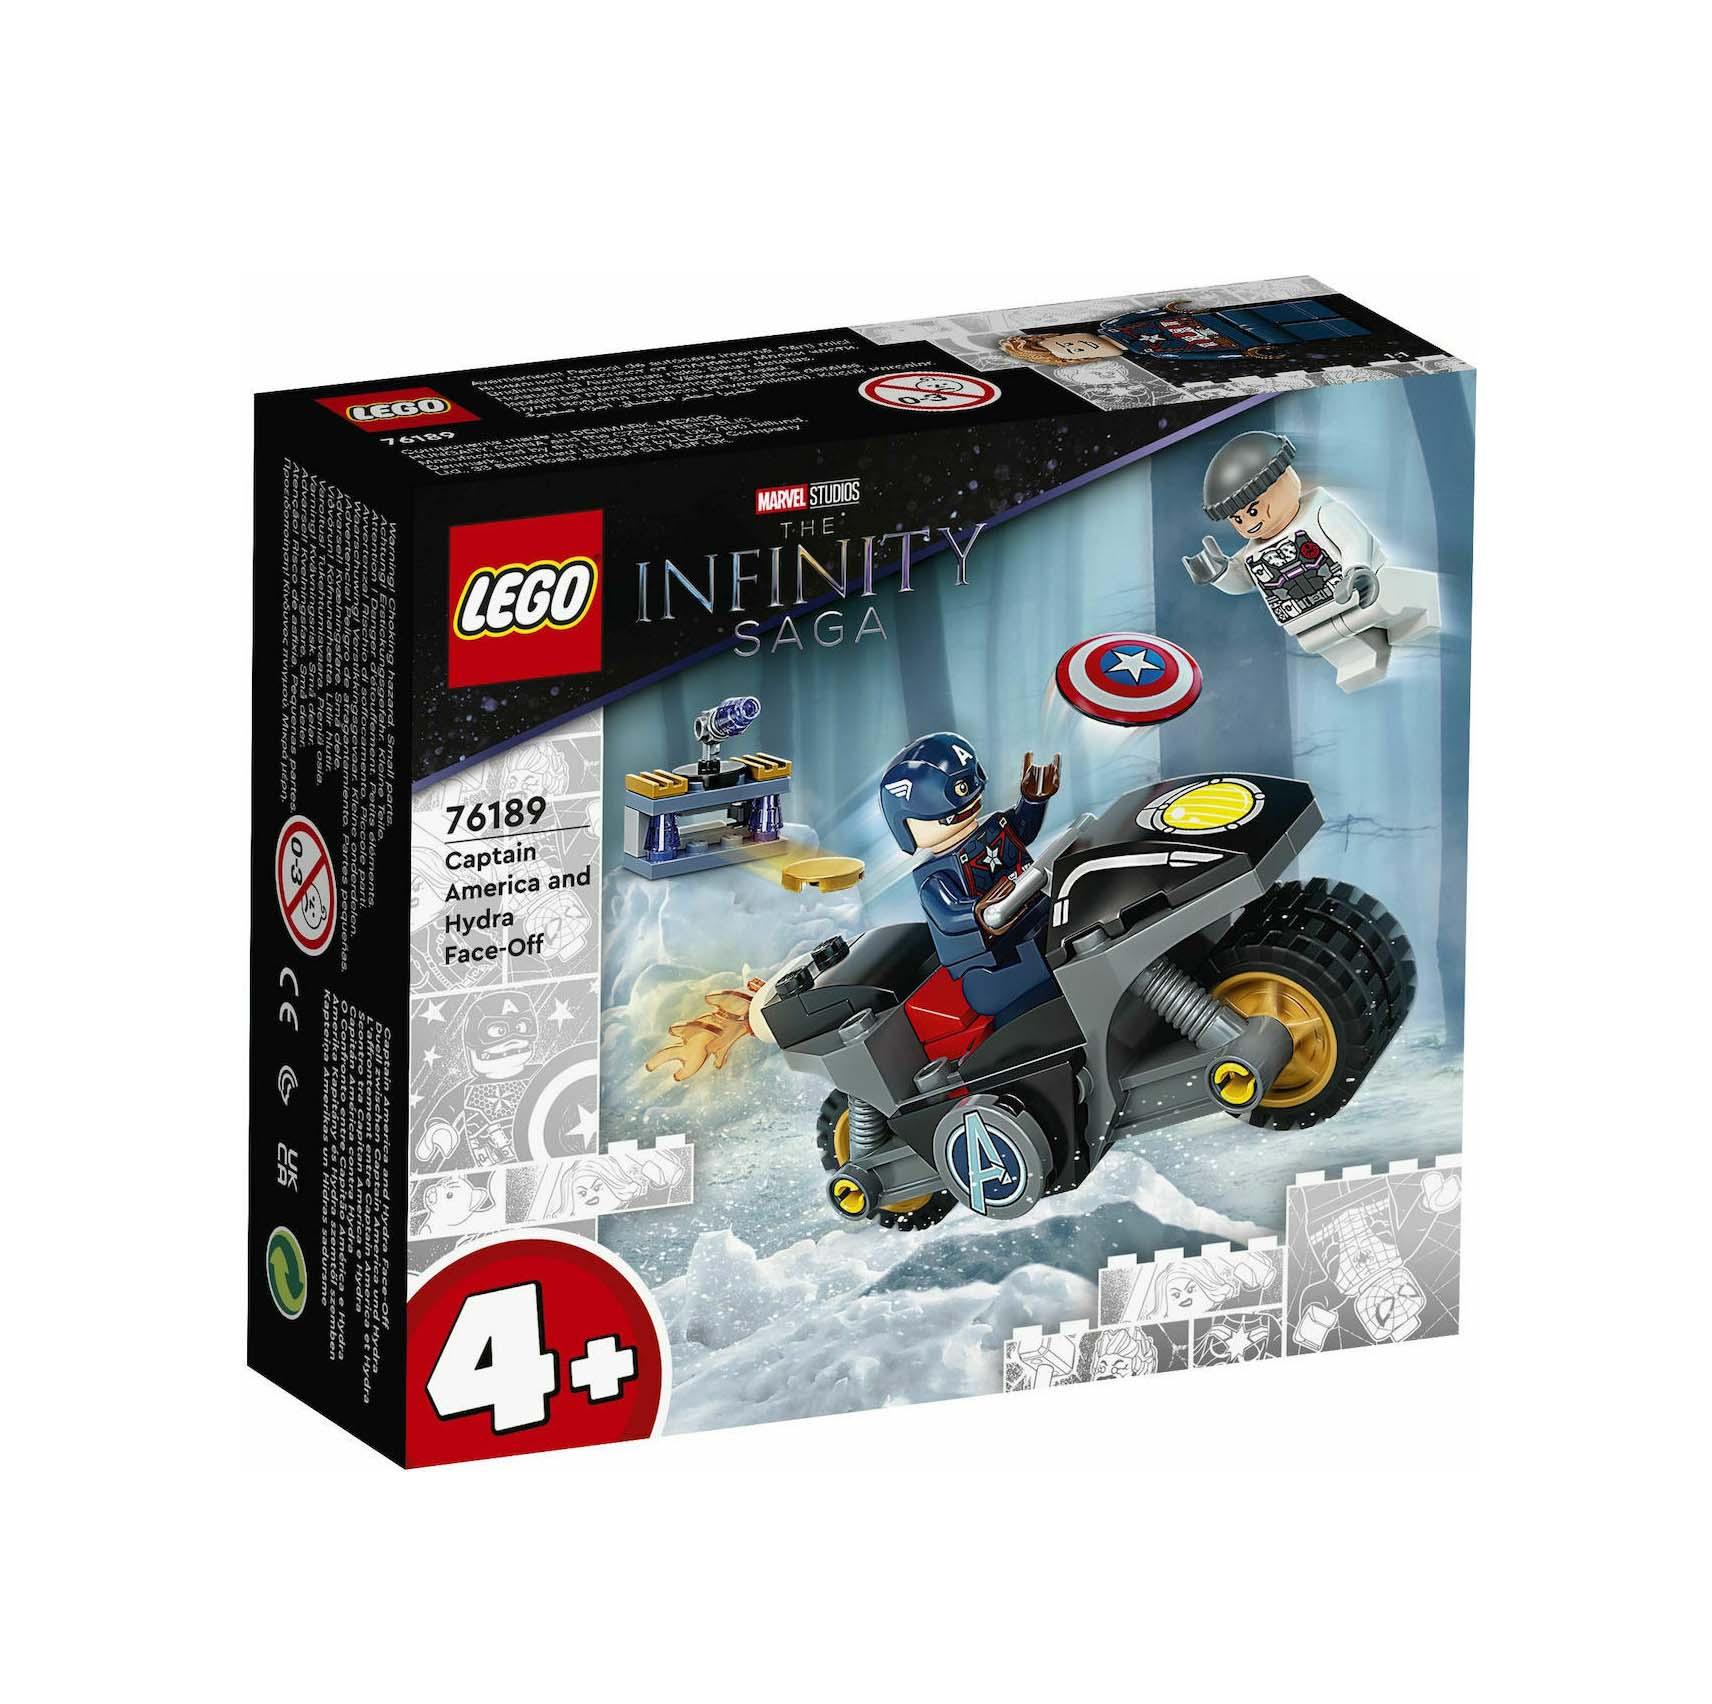 Lego The Infinity Saga: Captain America and Hydra Face-Off 76189